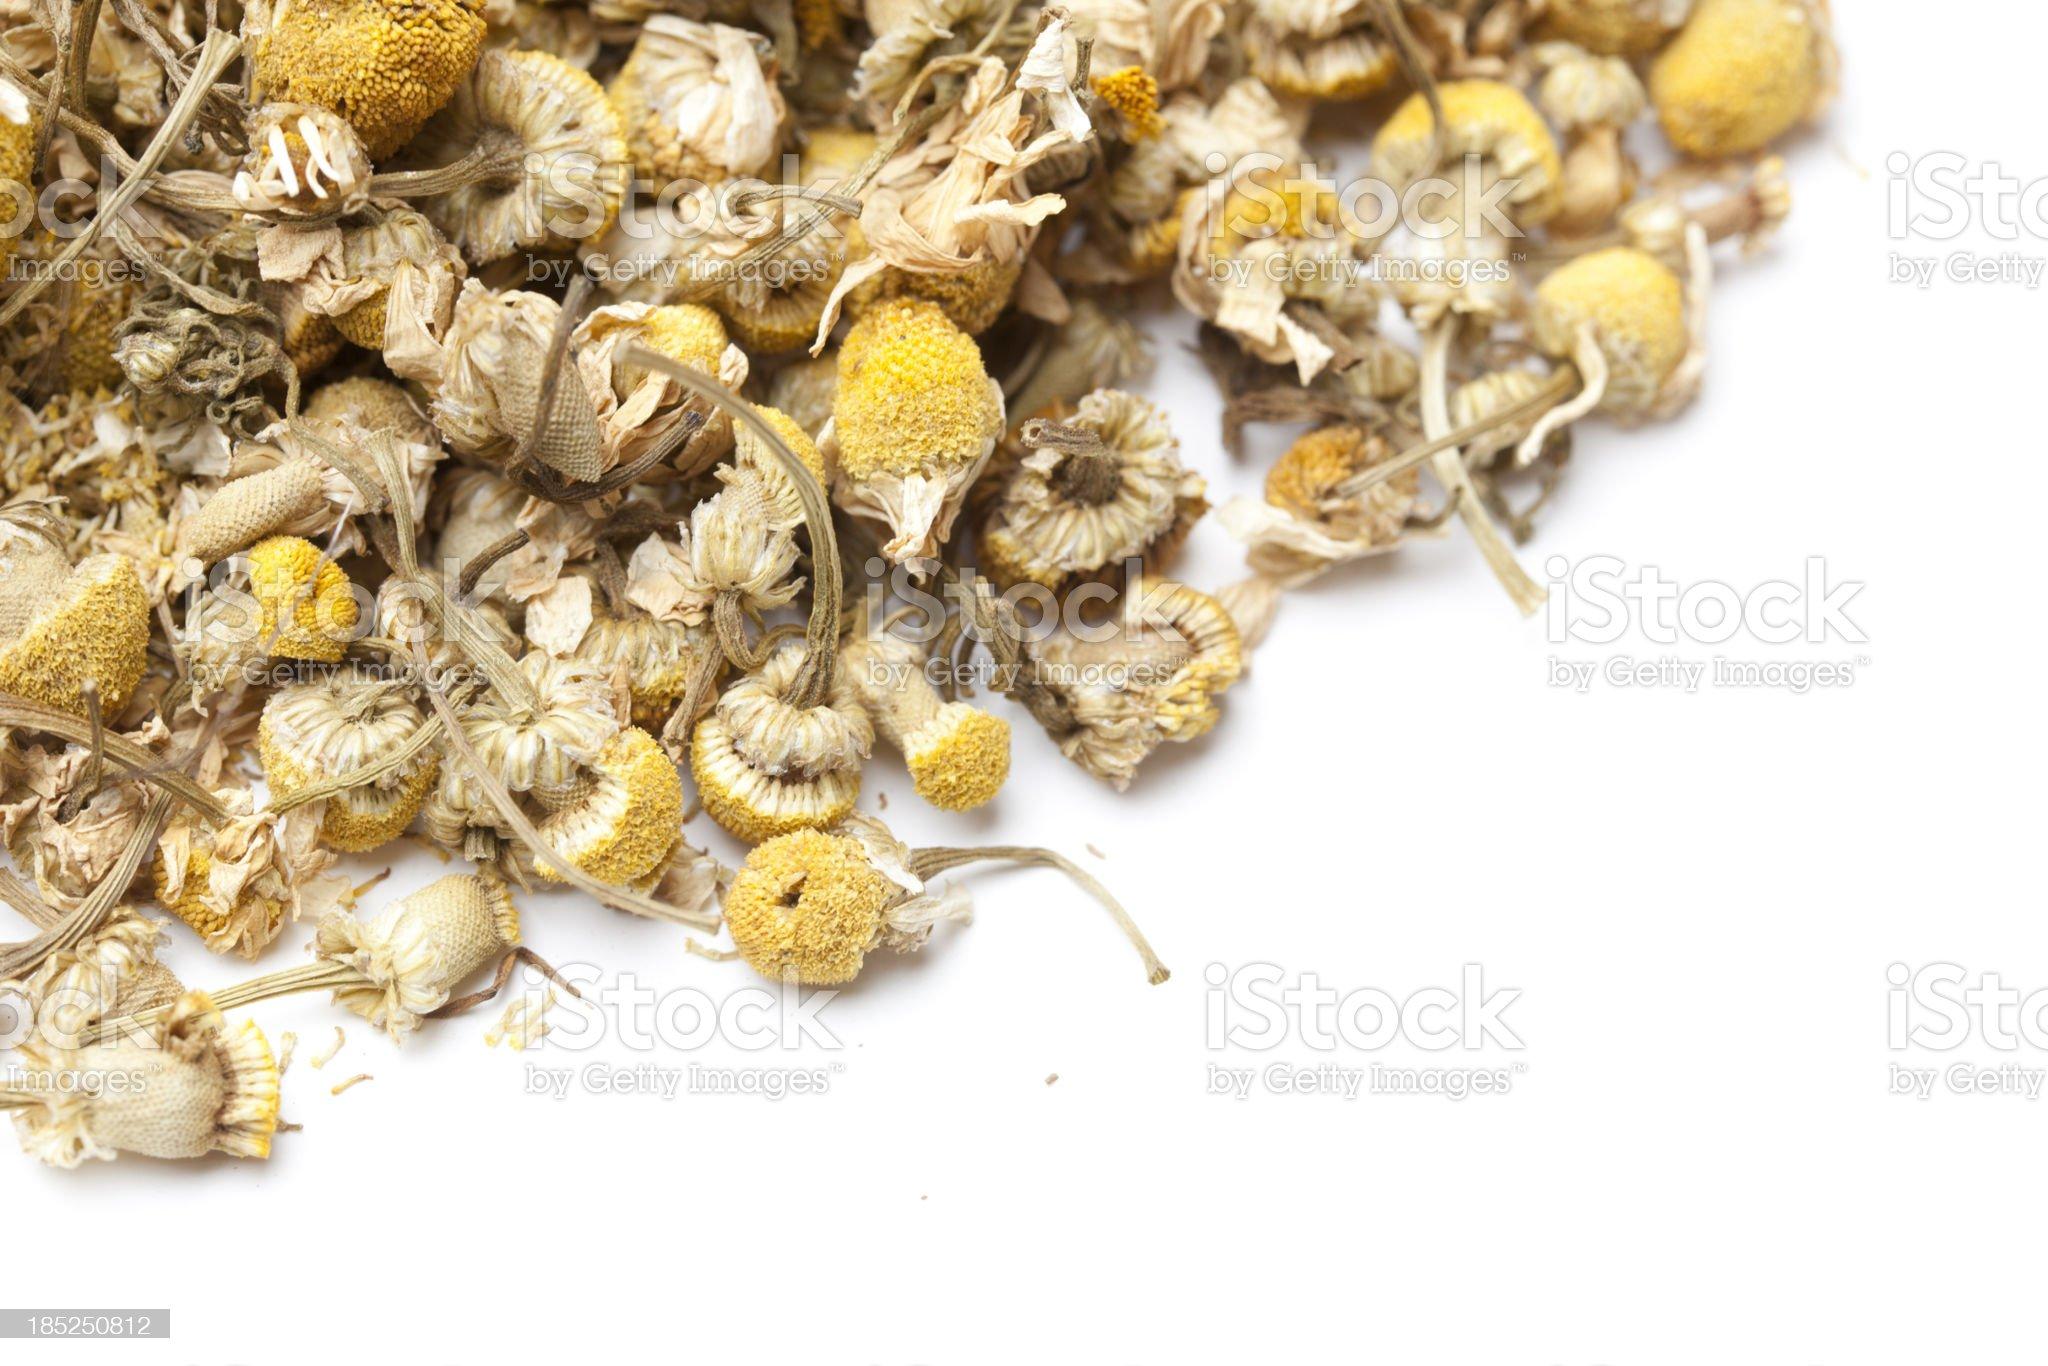 Chamomile Tea Flowers royalty-free stock photo